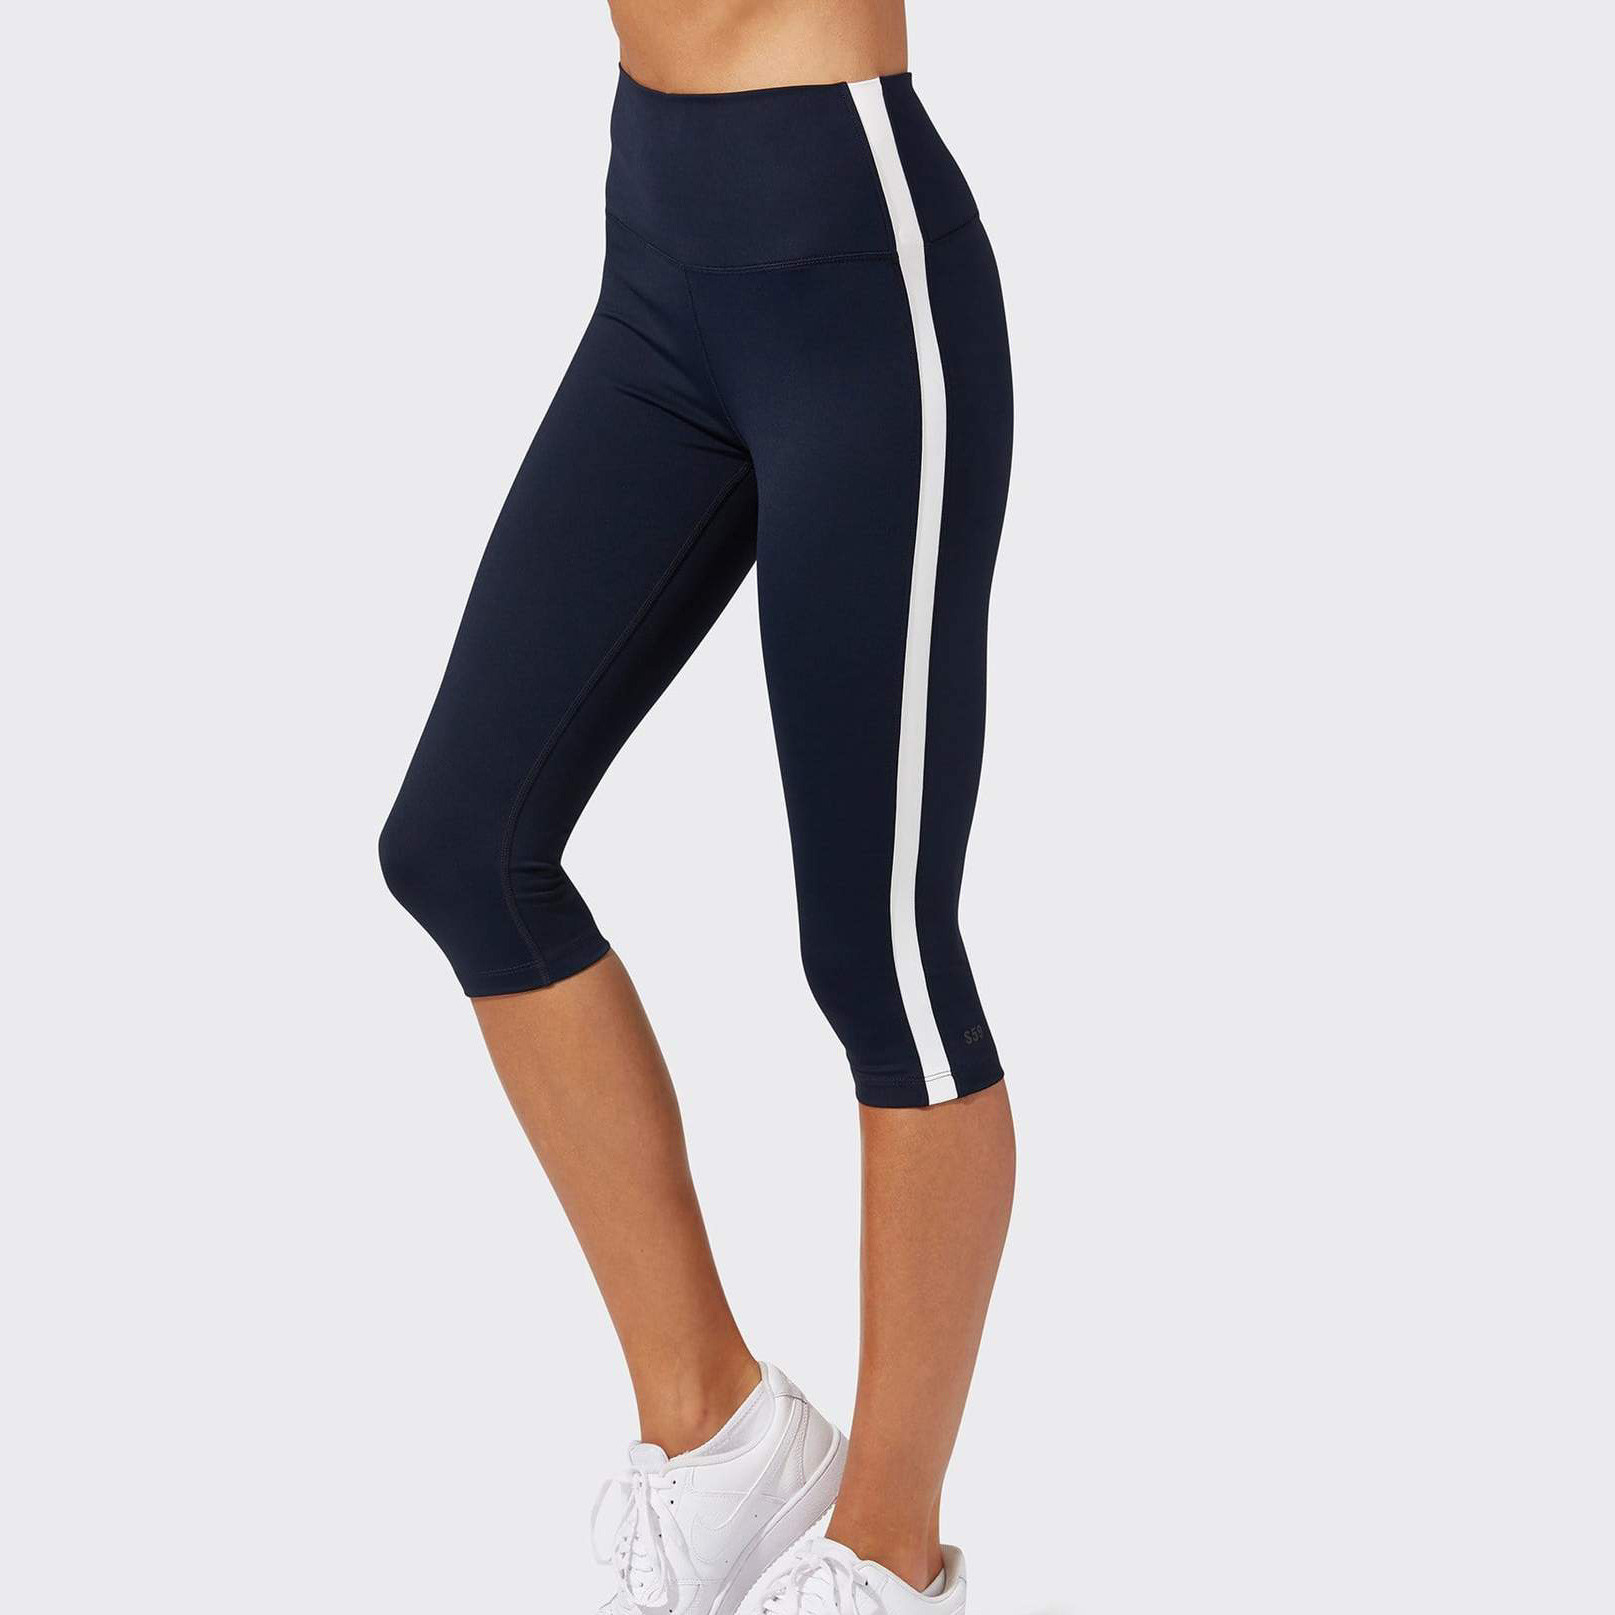 bulk leggings